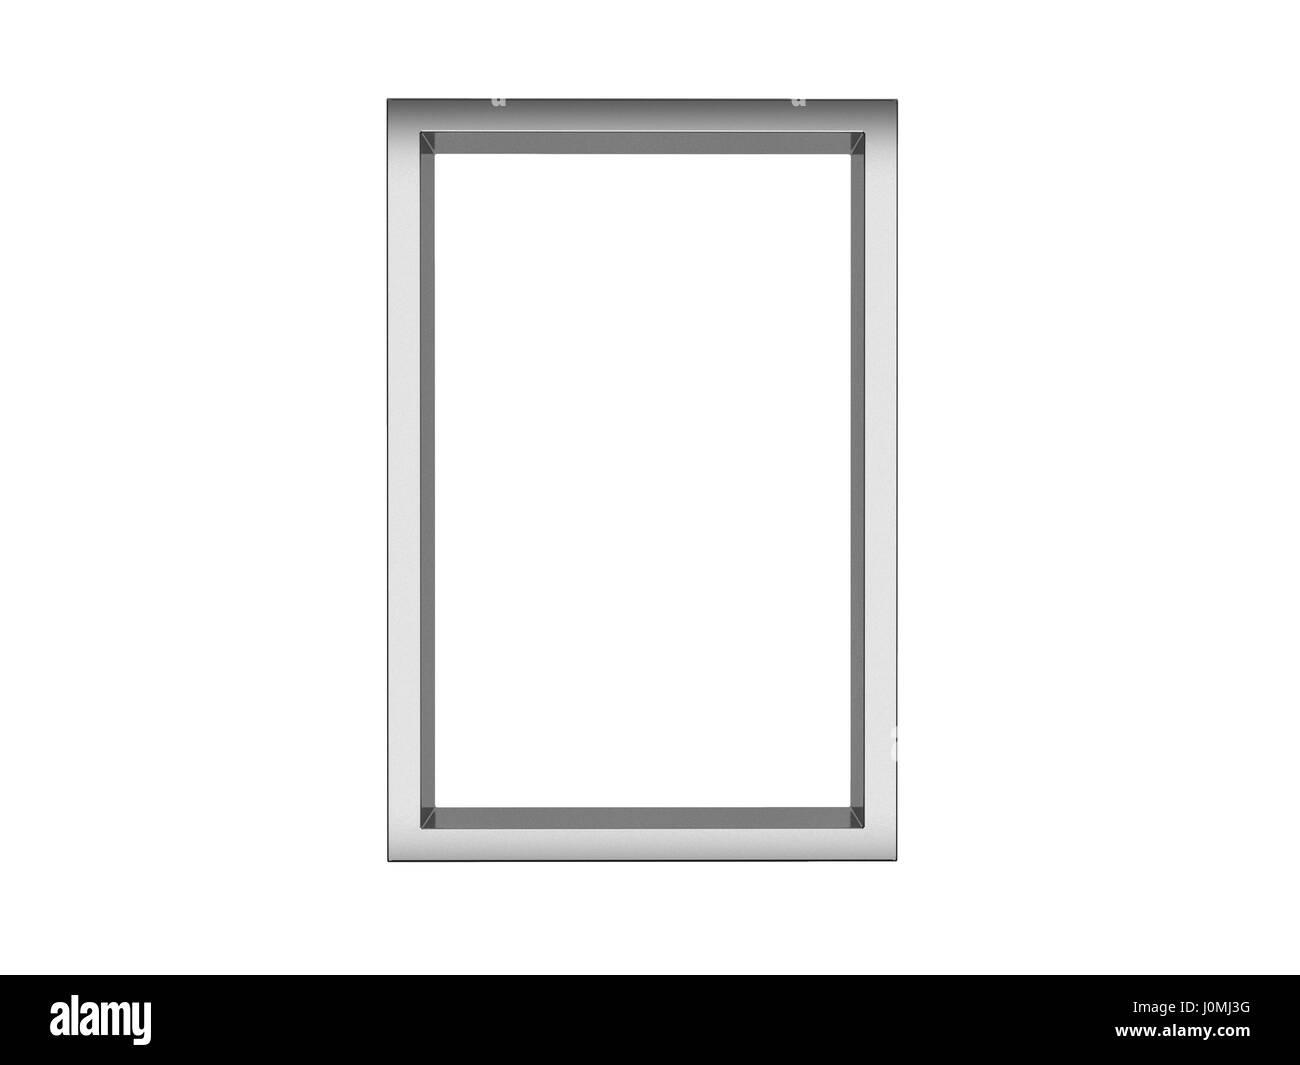 Gallery White Interior Empty Desk Stockfotos & Gallery White ...